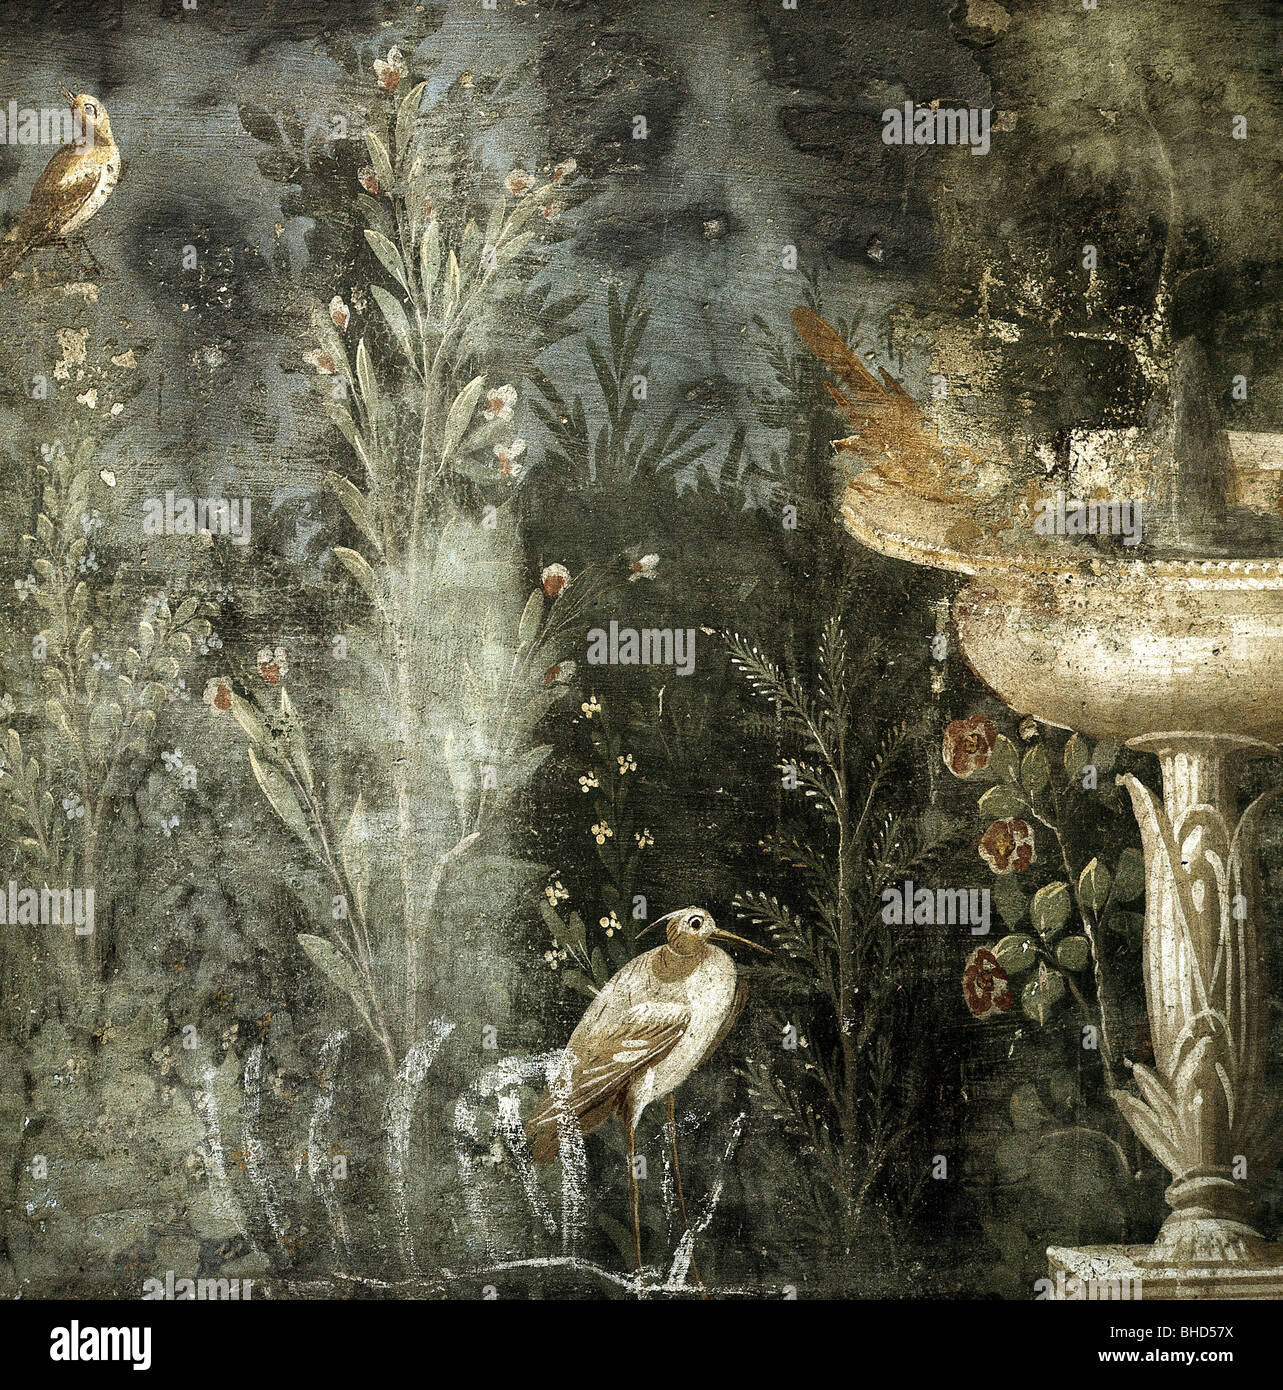 fine arts, Ancient World, Roman Empire, Pompeii, detail from a fresco, garden scene, House of Venus, Italy, historic, Stock Photo